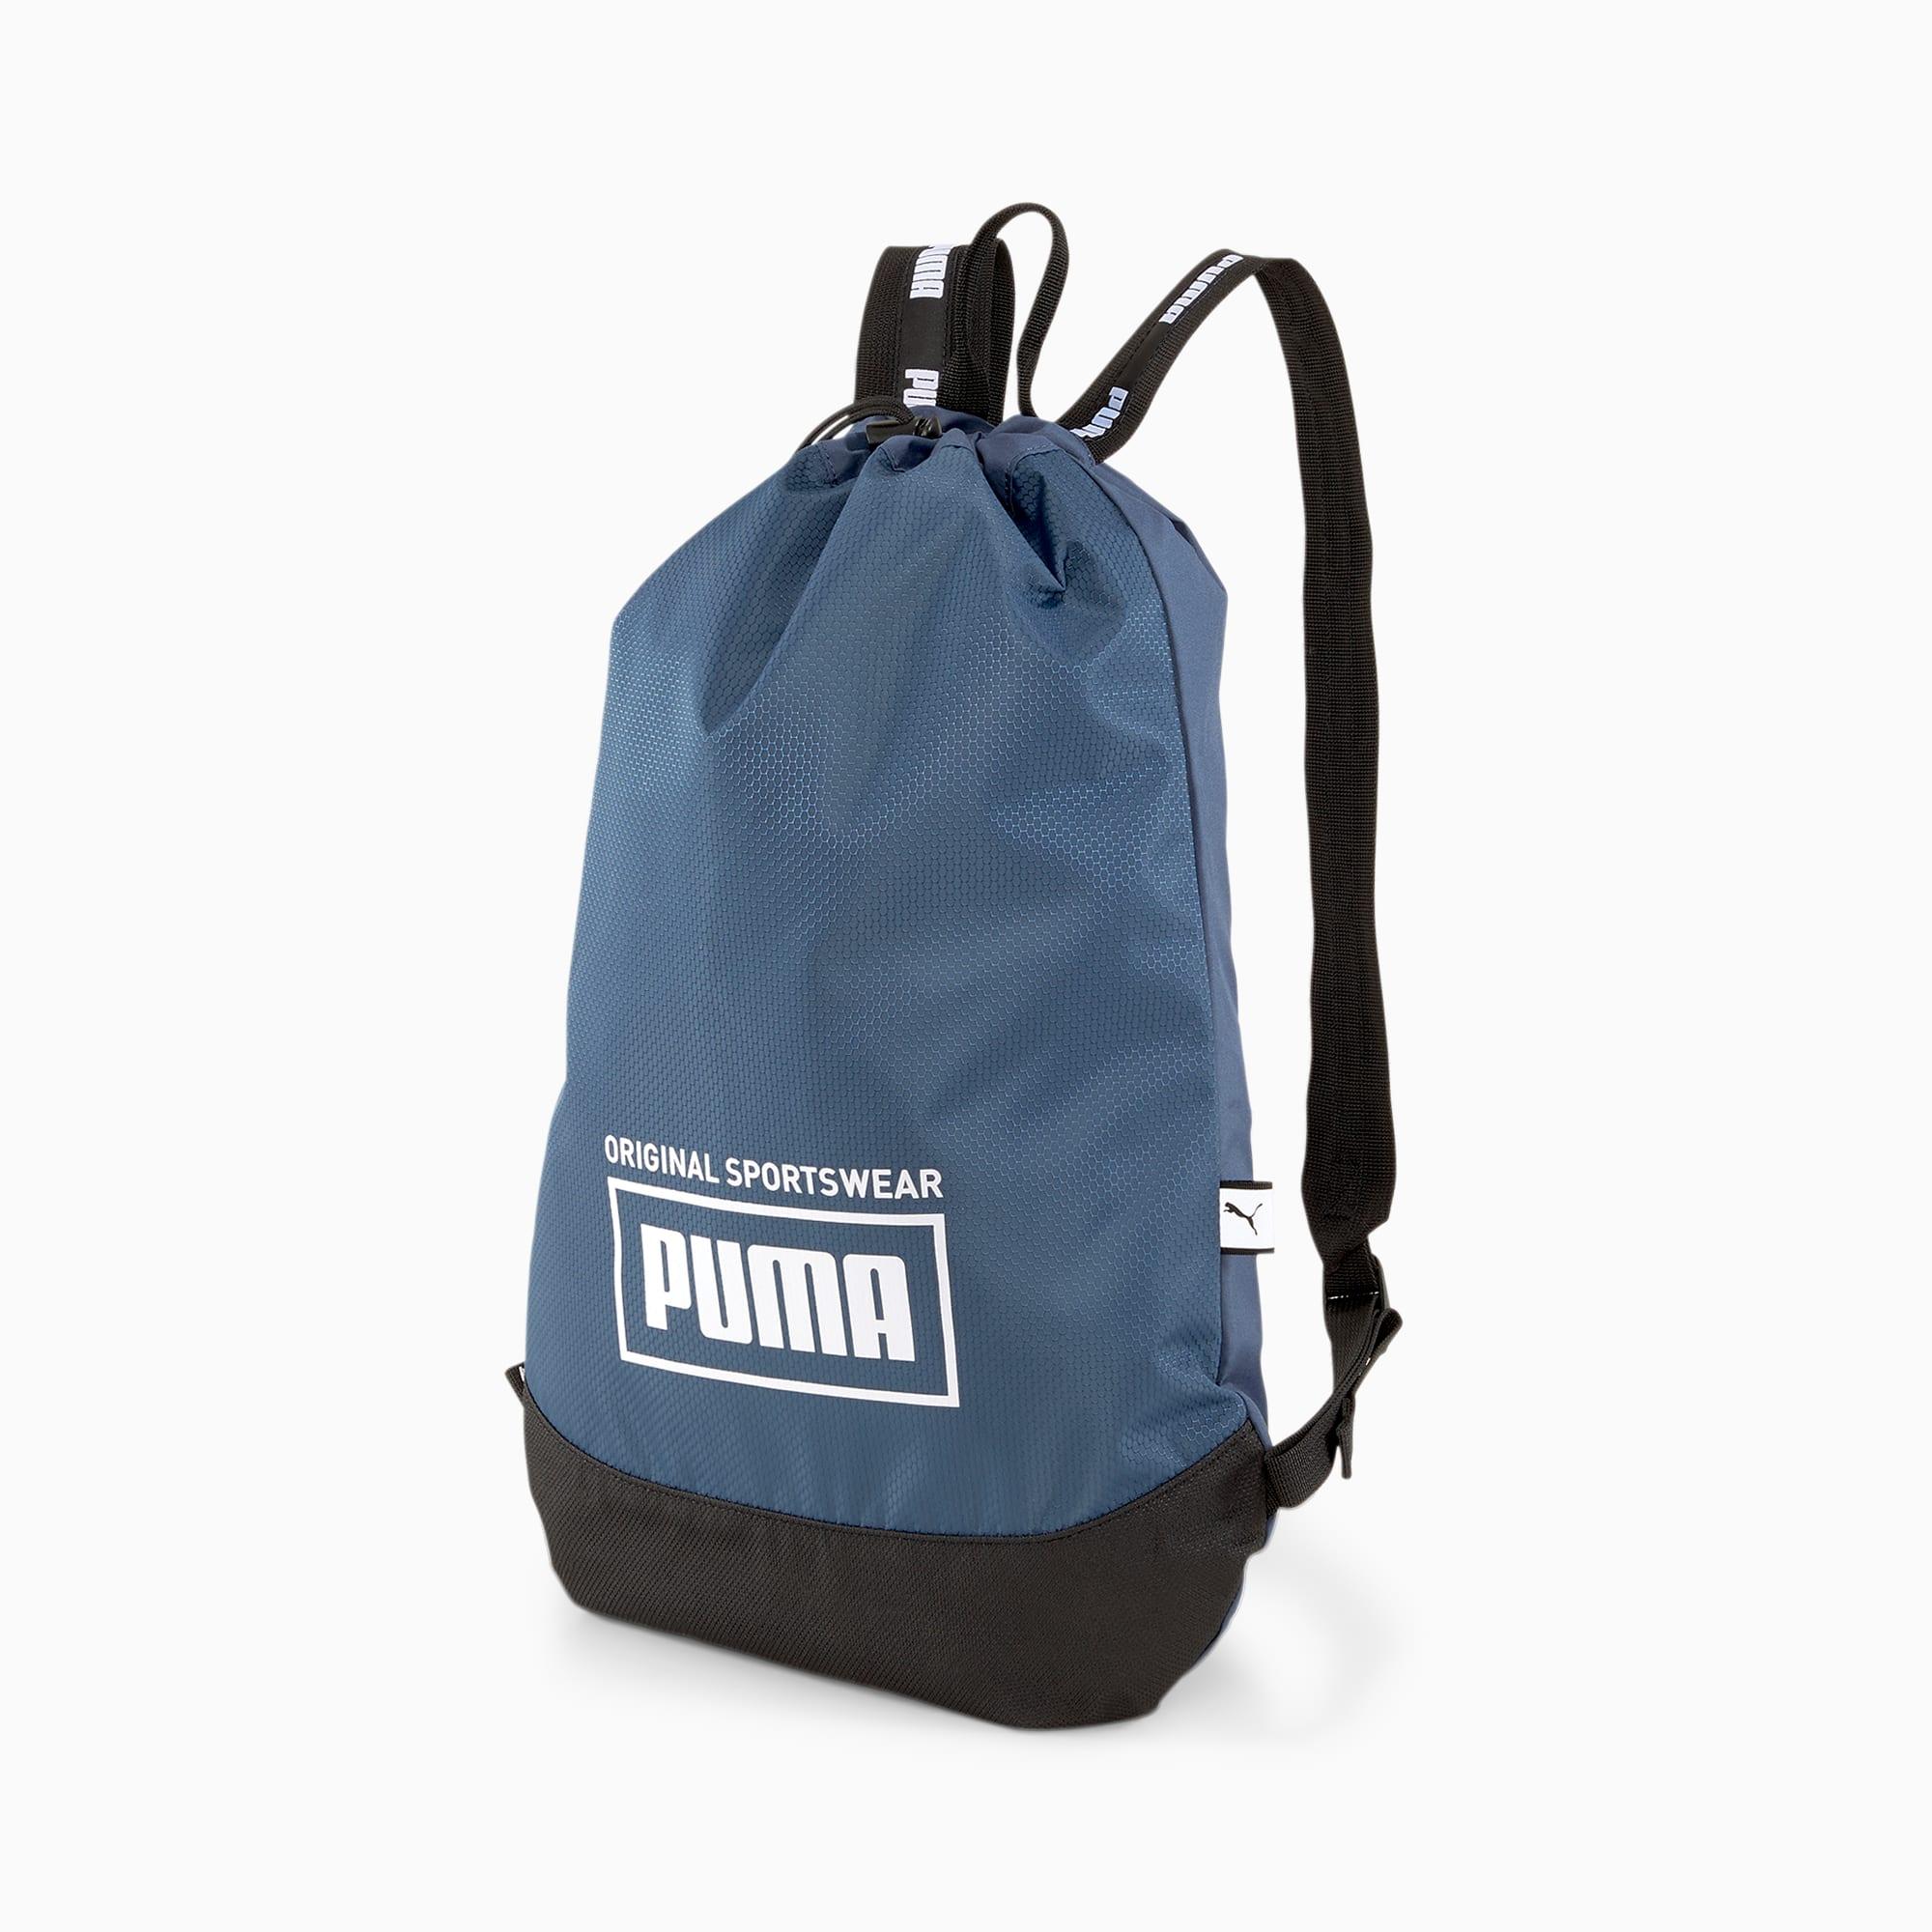 PUMA Sole Smart Bag, Dark Denim, extralarge